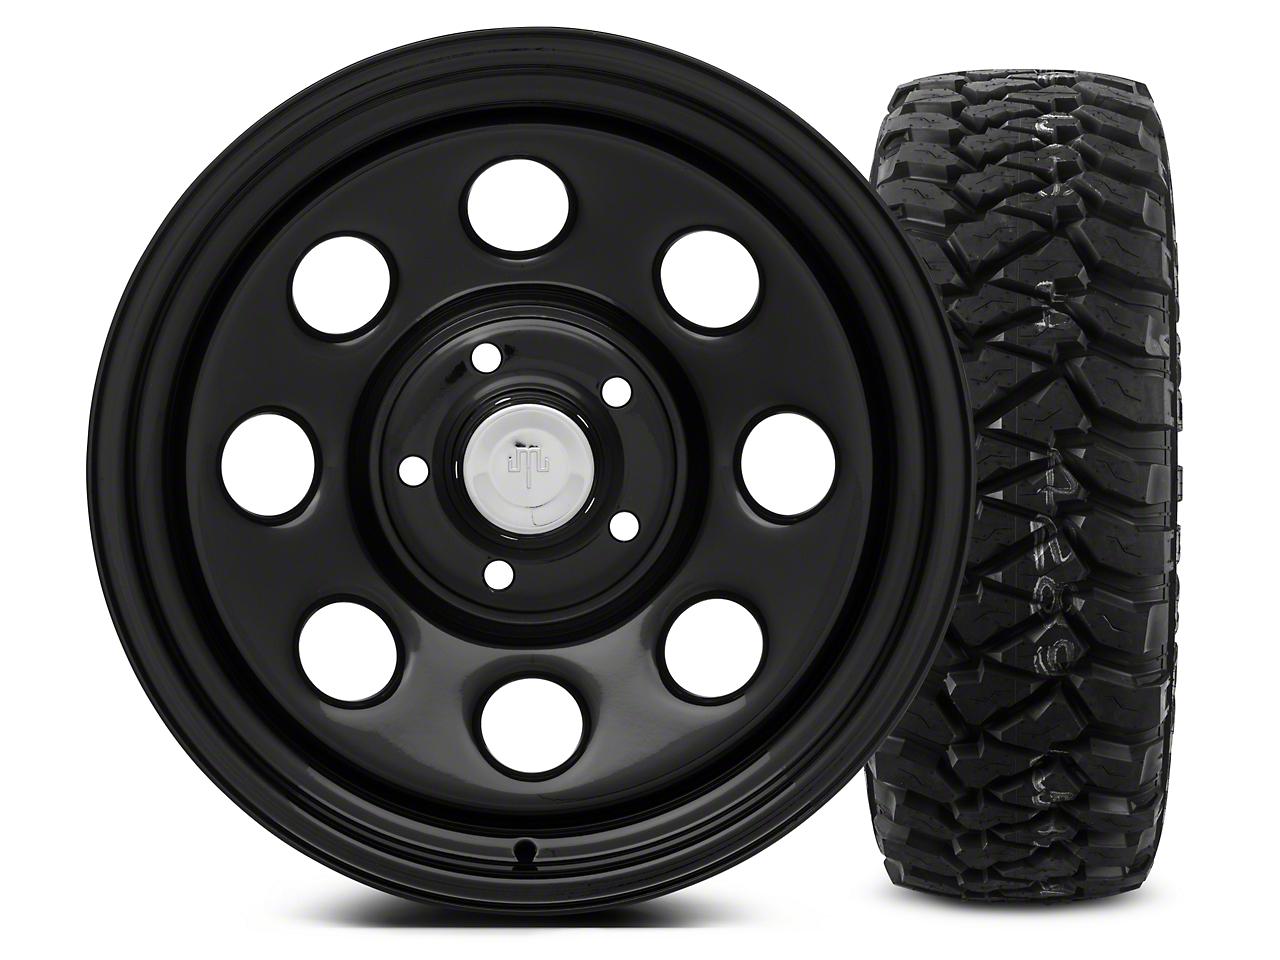 Mammoth 8 Black Steel - 17x9 Wheel - and Mickey Thompson Baja MTZP3 Tire - 285/70R17 (07-18 Jeep Wrangler JK; 2018 Jeep Wrangler JL)